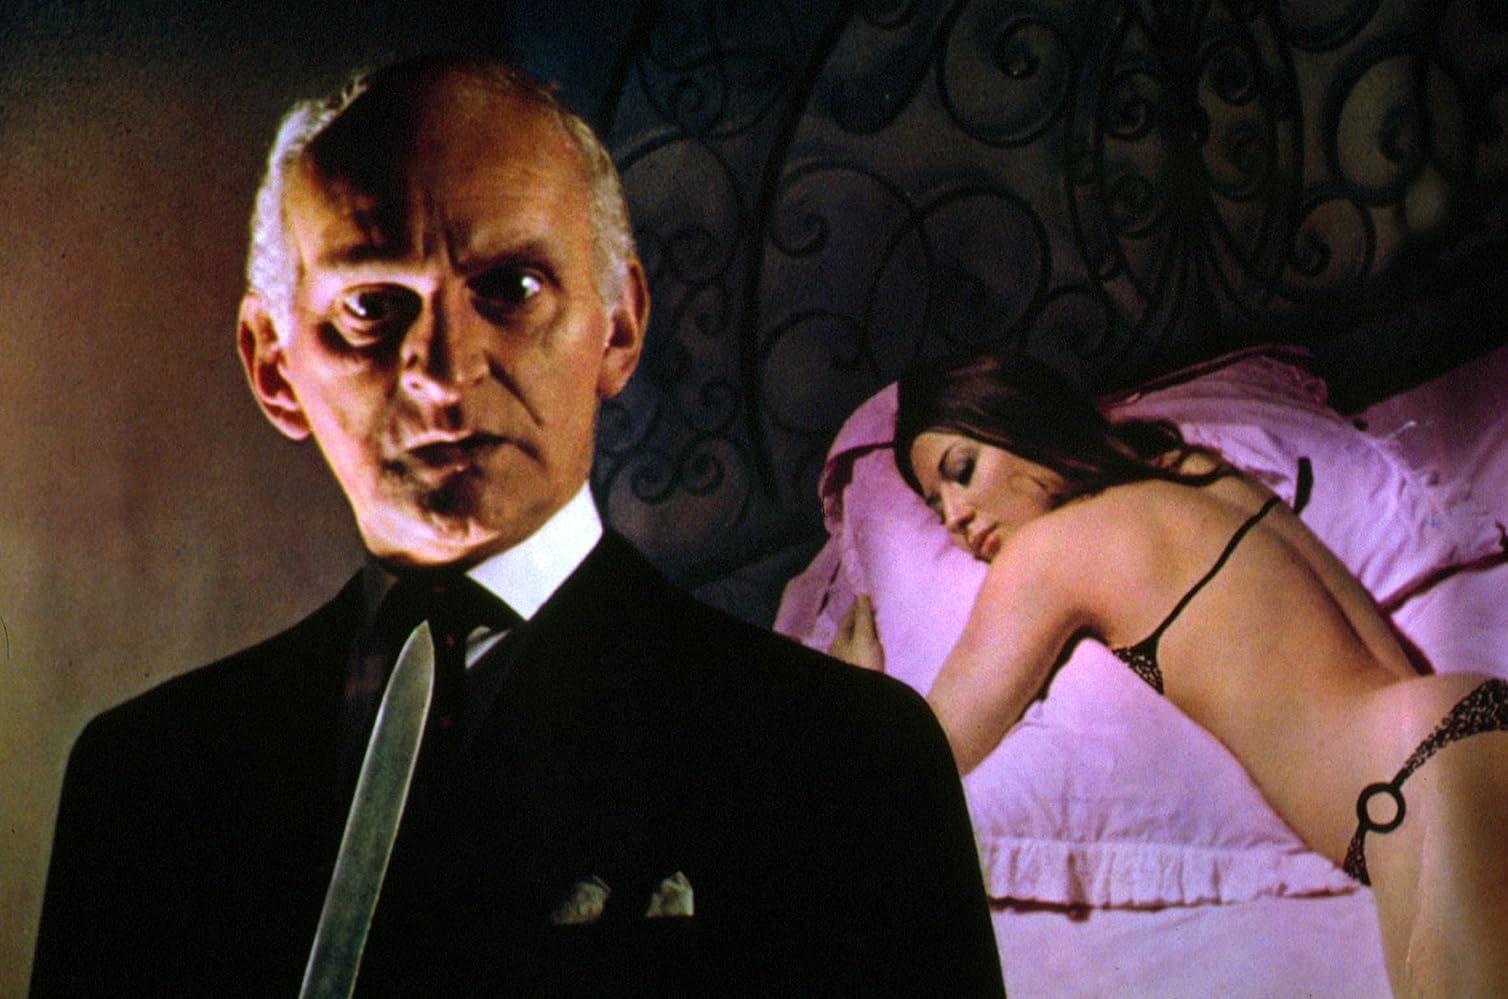 John Karlsen and Rosalba Neri in La bestia uccide a sangue freddo (1971)